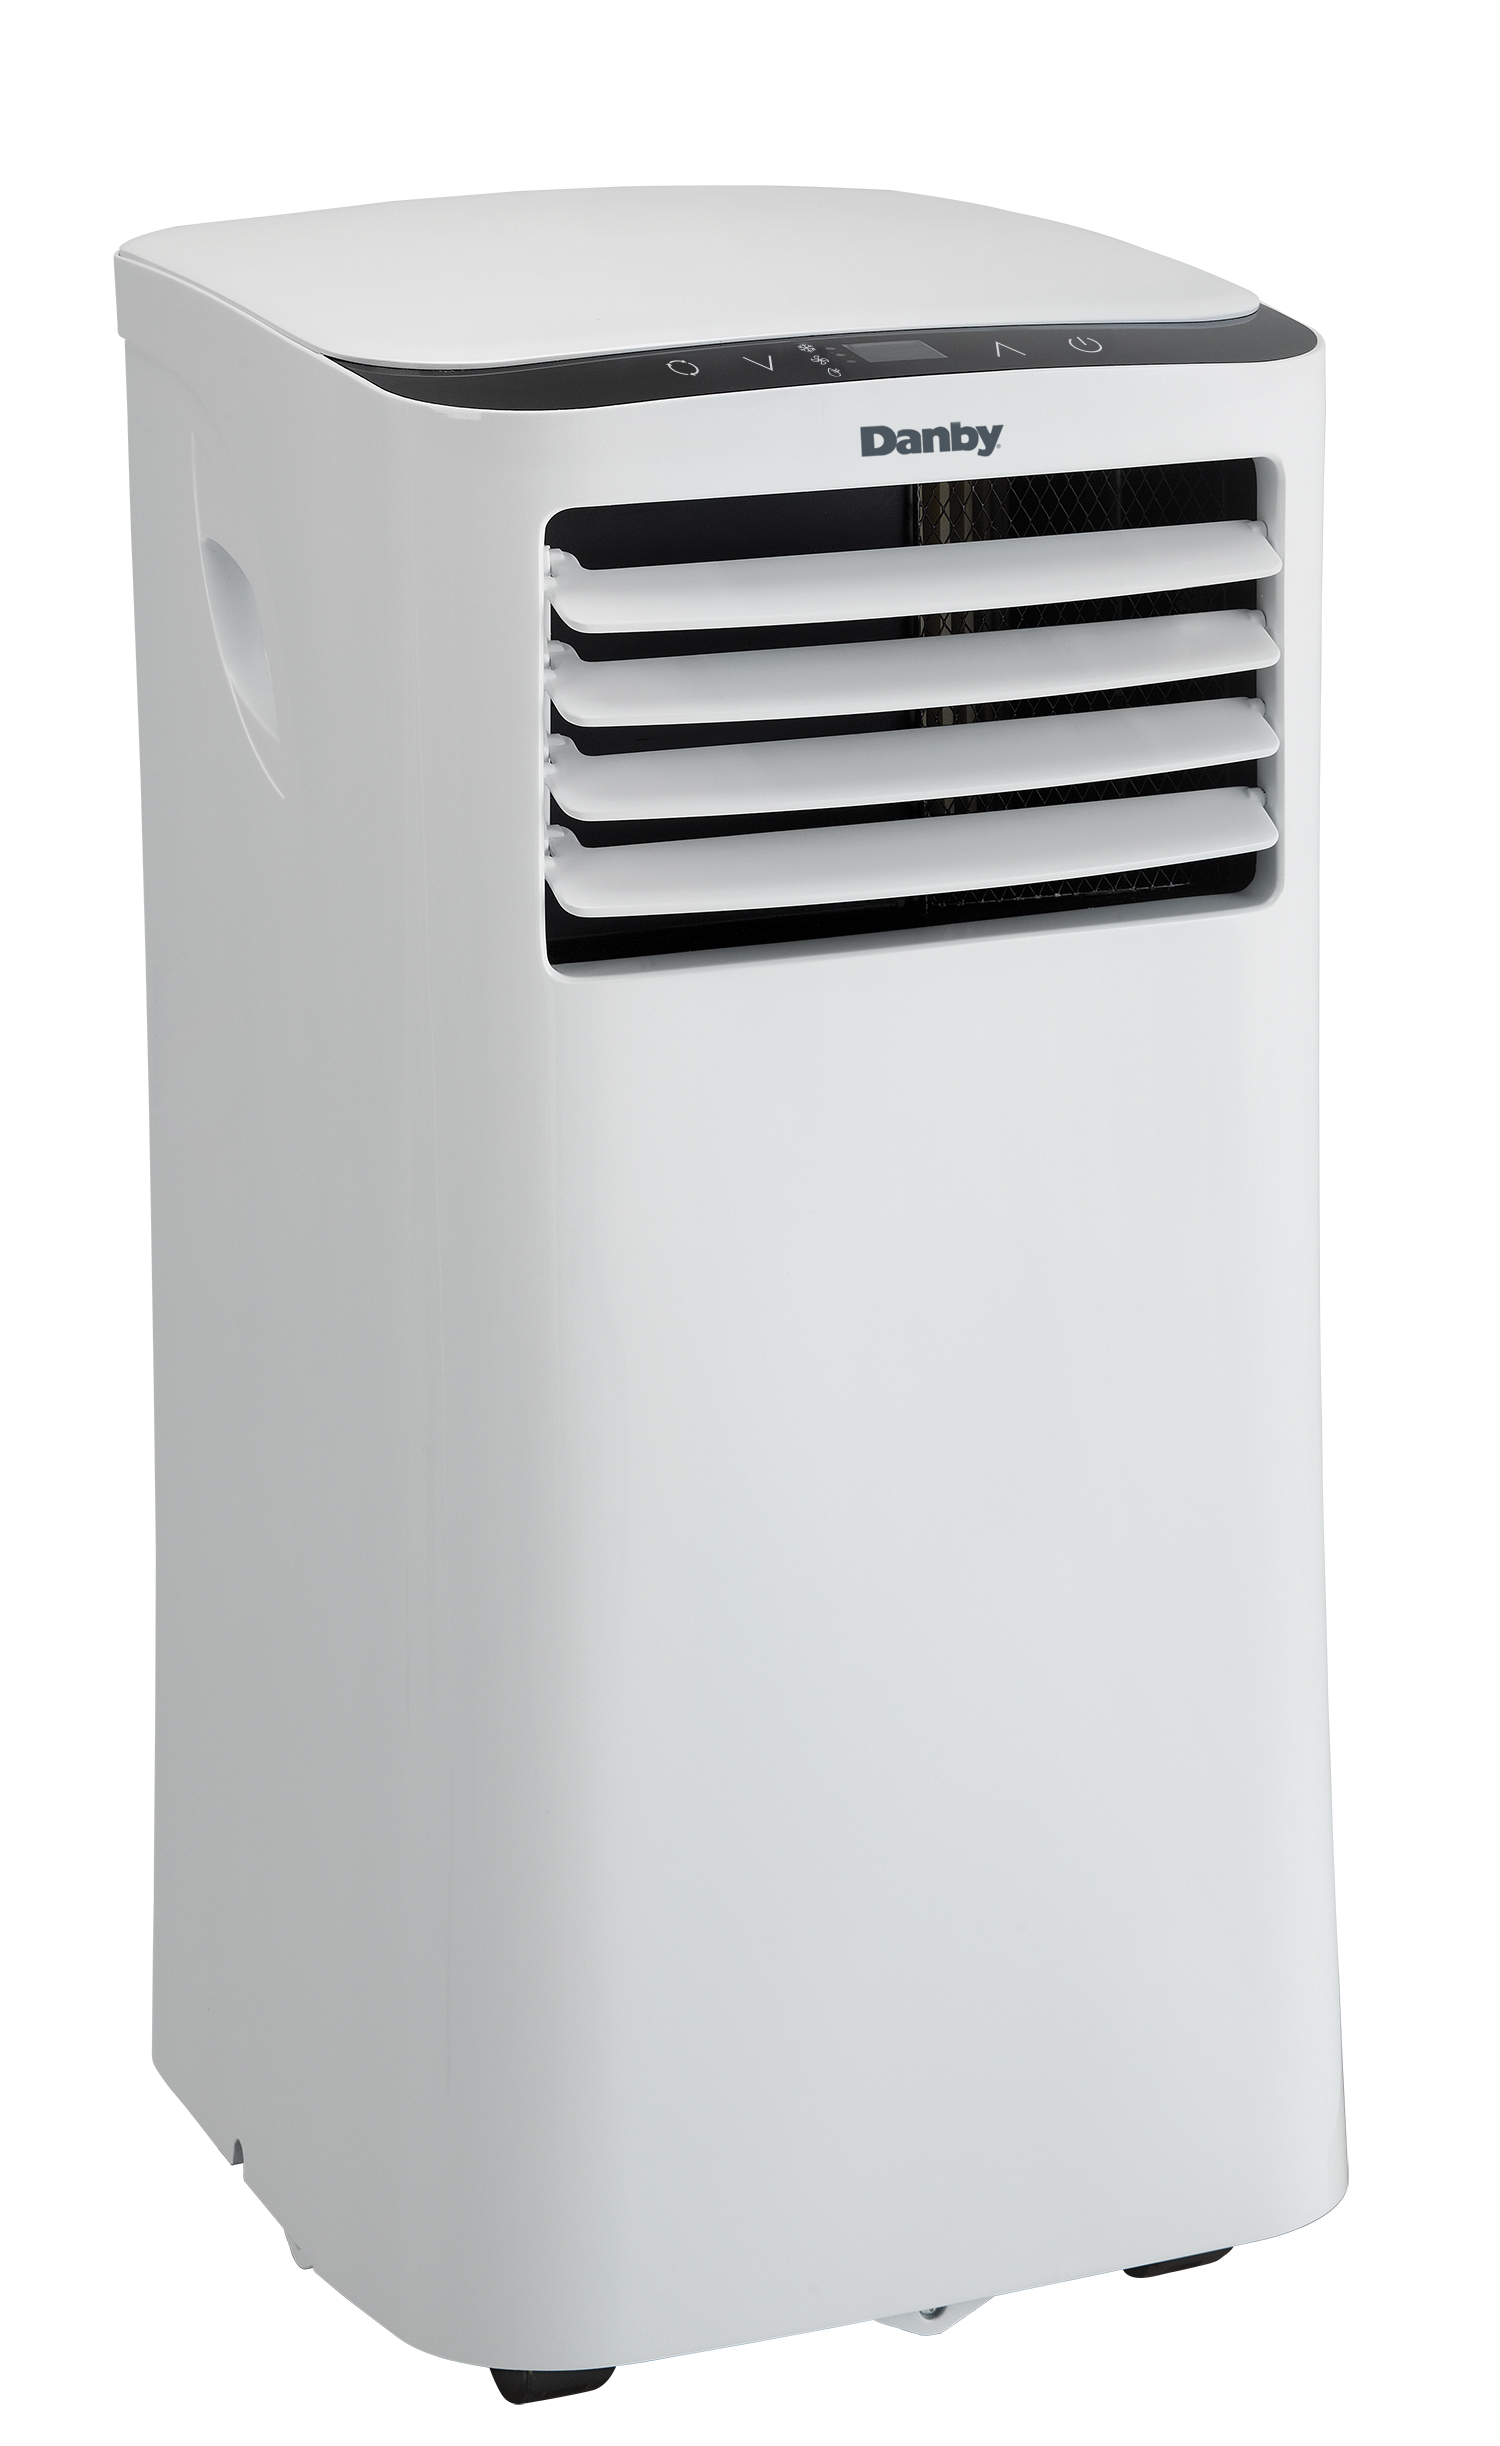 Dpa080ub1gdb Danby 8000 Btu Portable Air Conditioner En Us